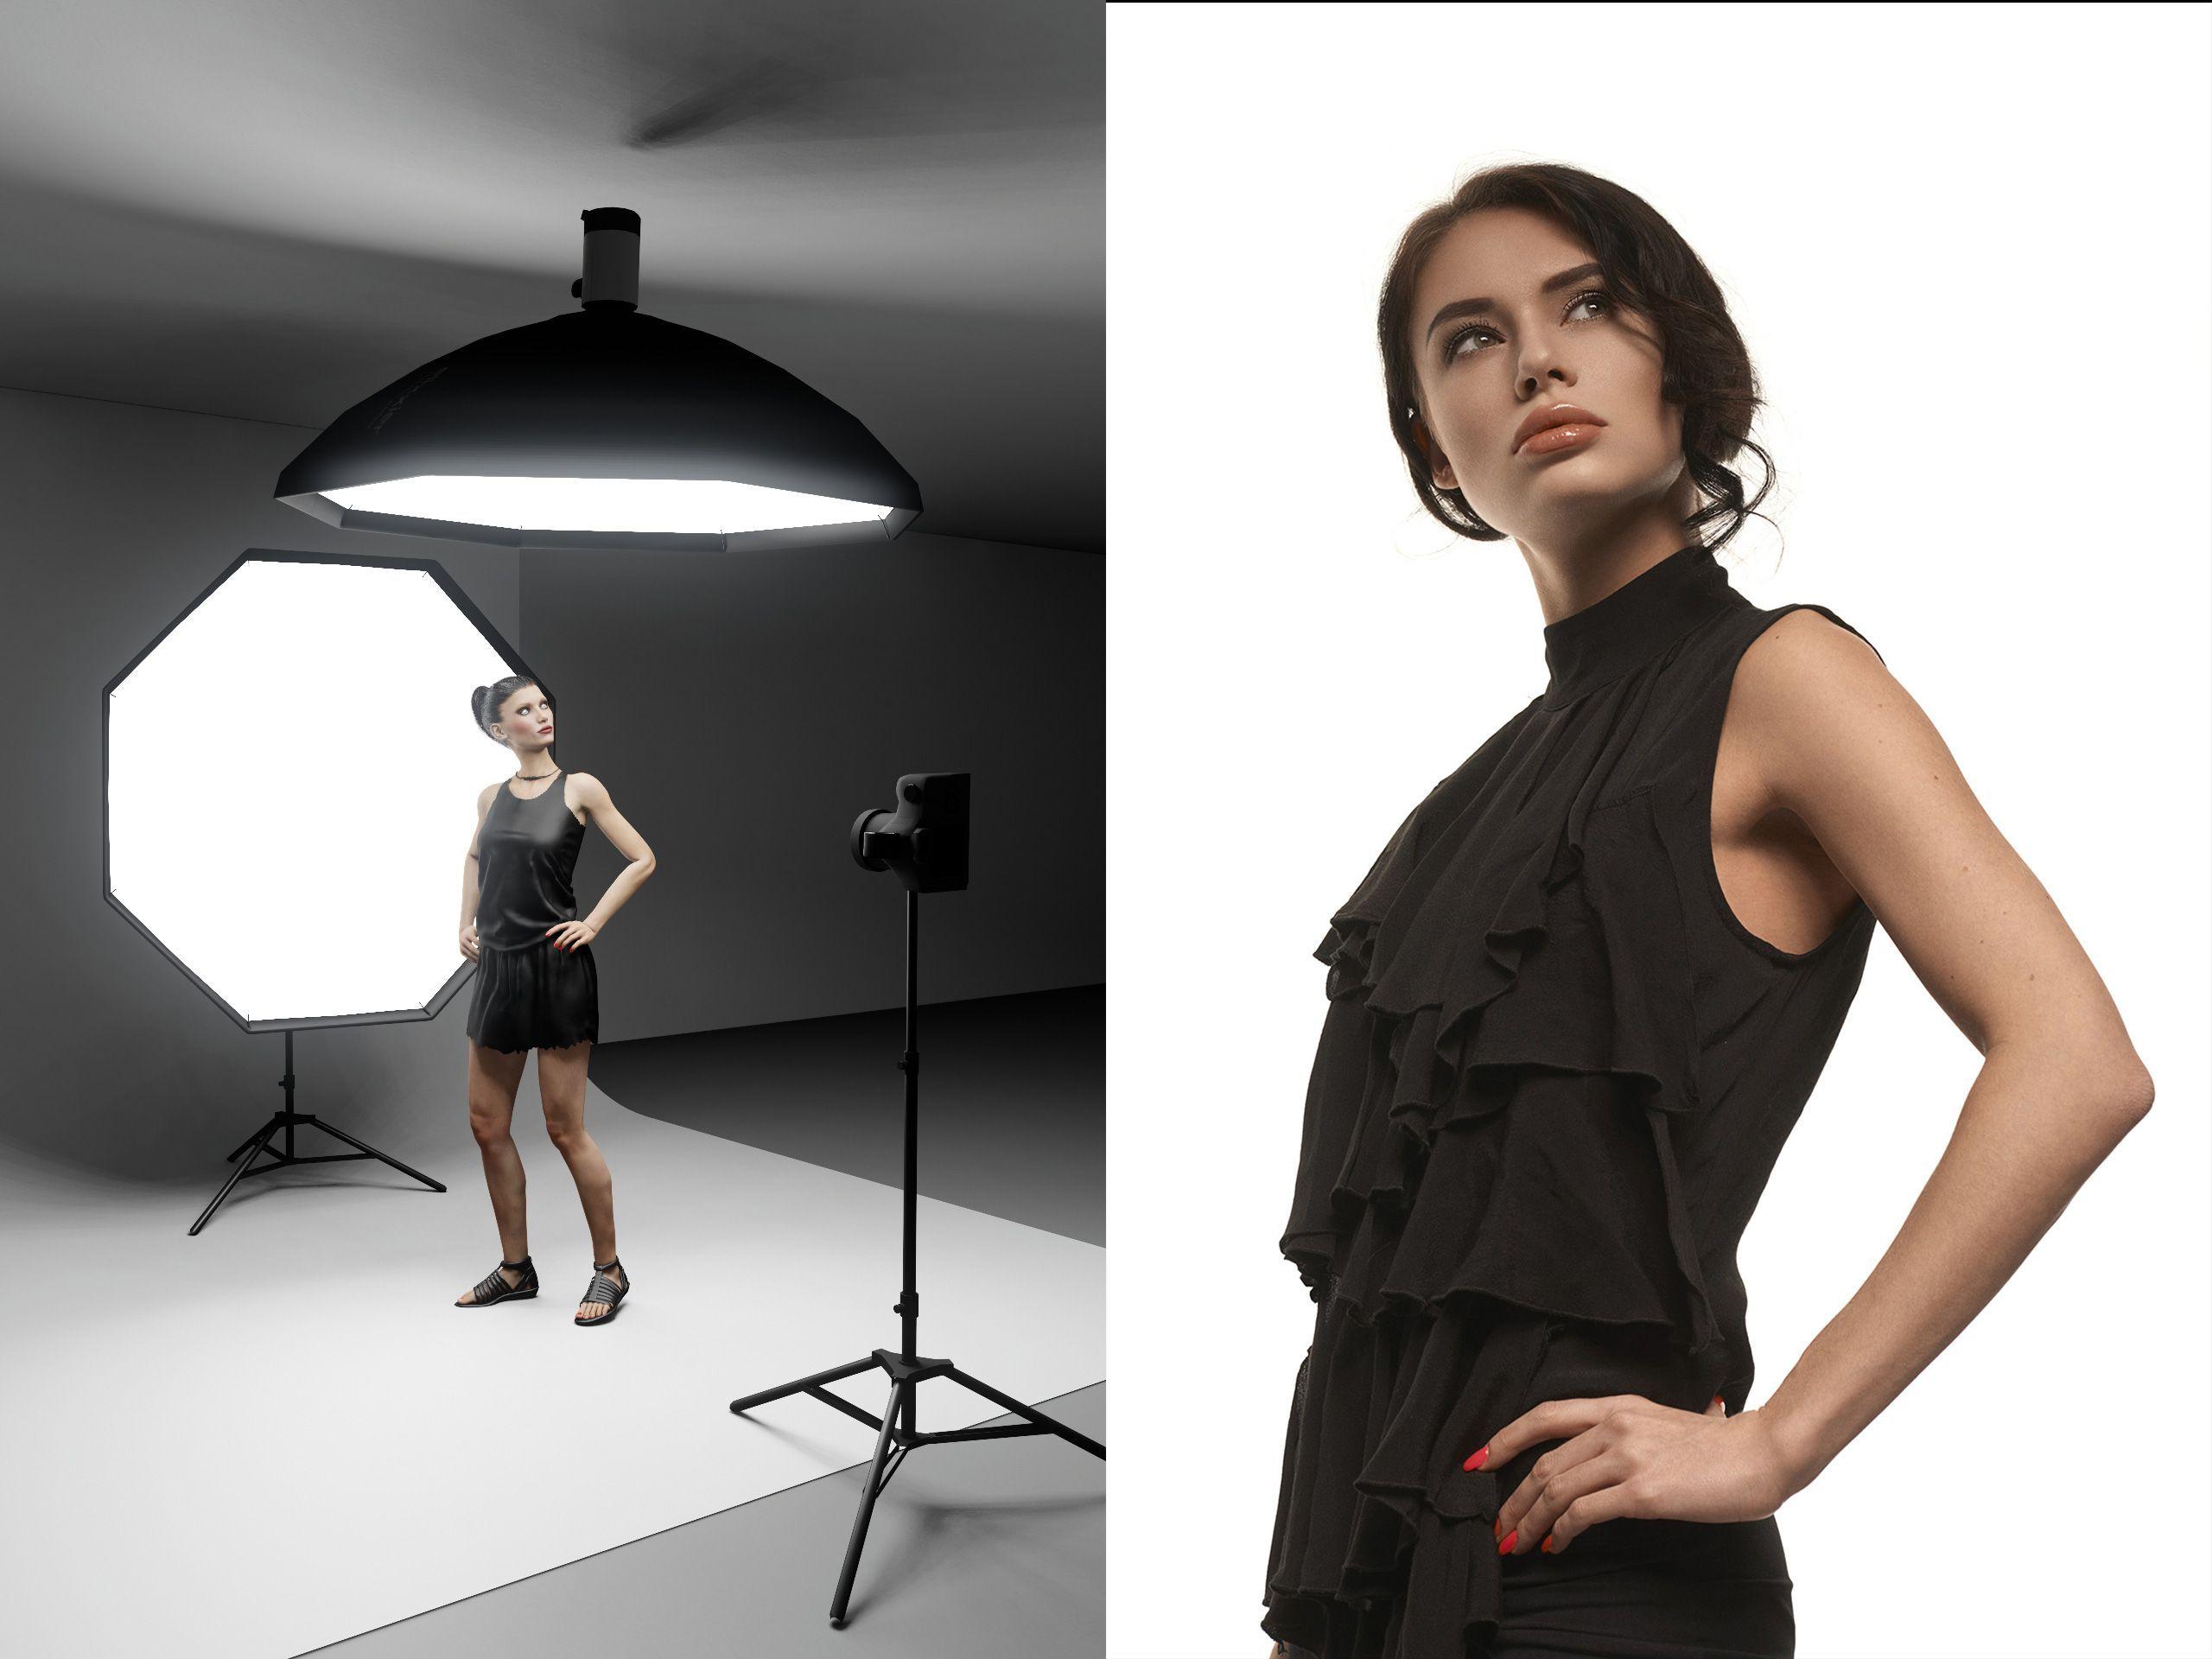 How to create a perfectly white background - The Lighting Series #4 - DIY Ph… | Studio lighting setups, Studio photography lighting, Photography lighting techniques